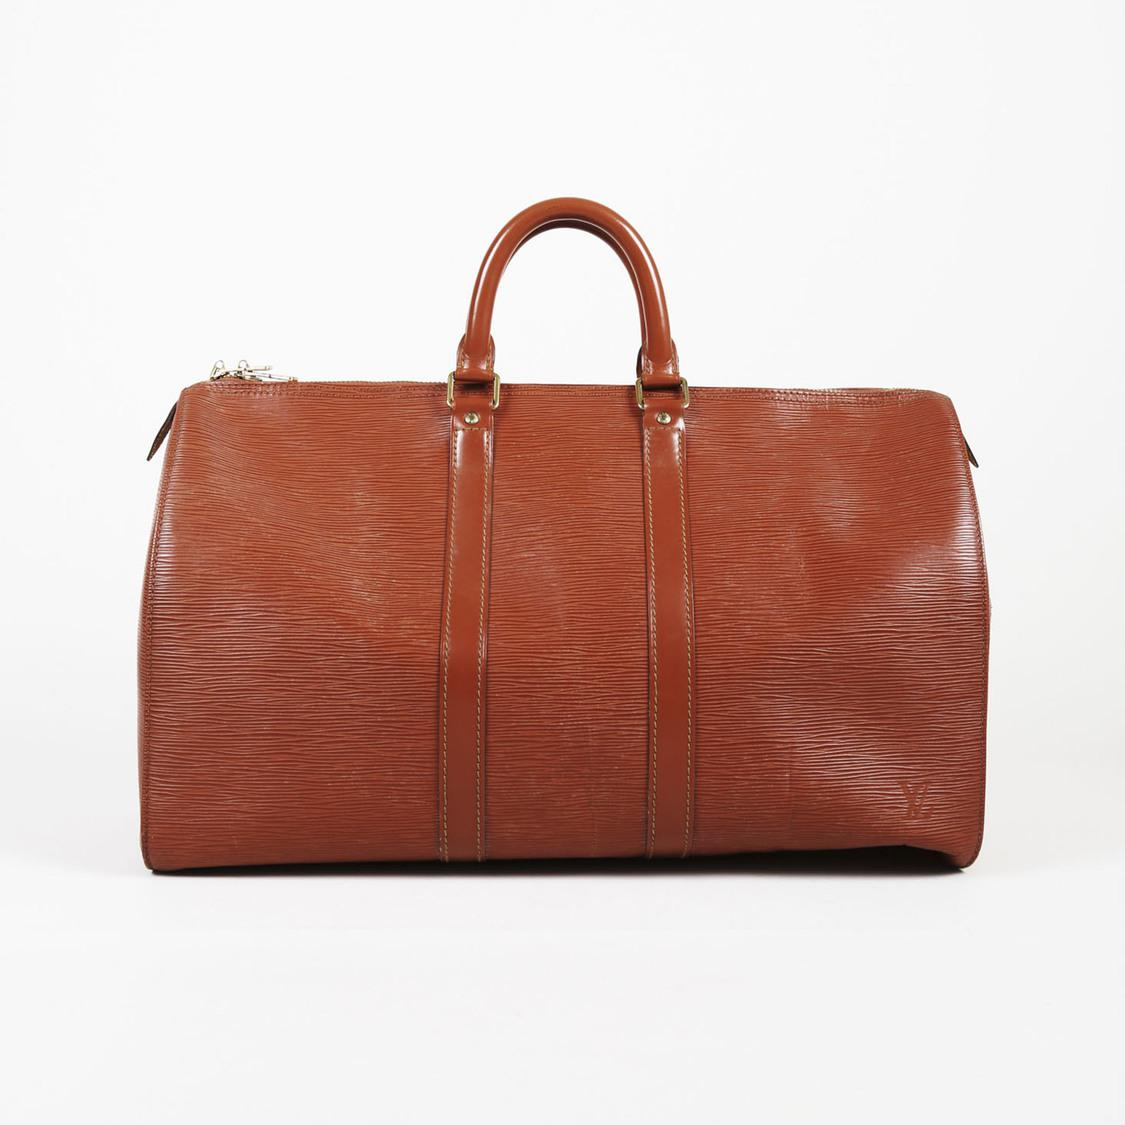 ffd23b6f2ab9 Louis Vuitton. Women s Vintage Brown Epi Leather